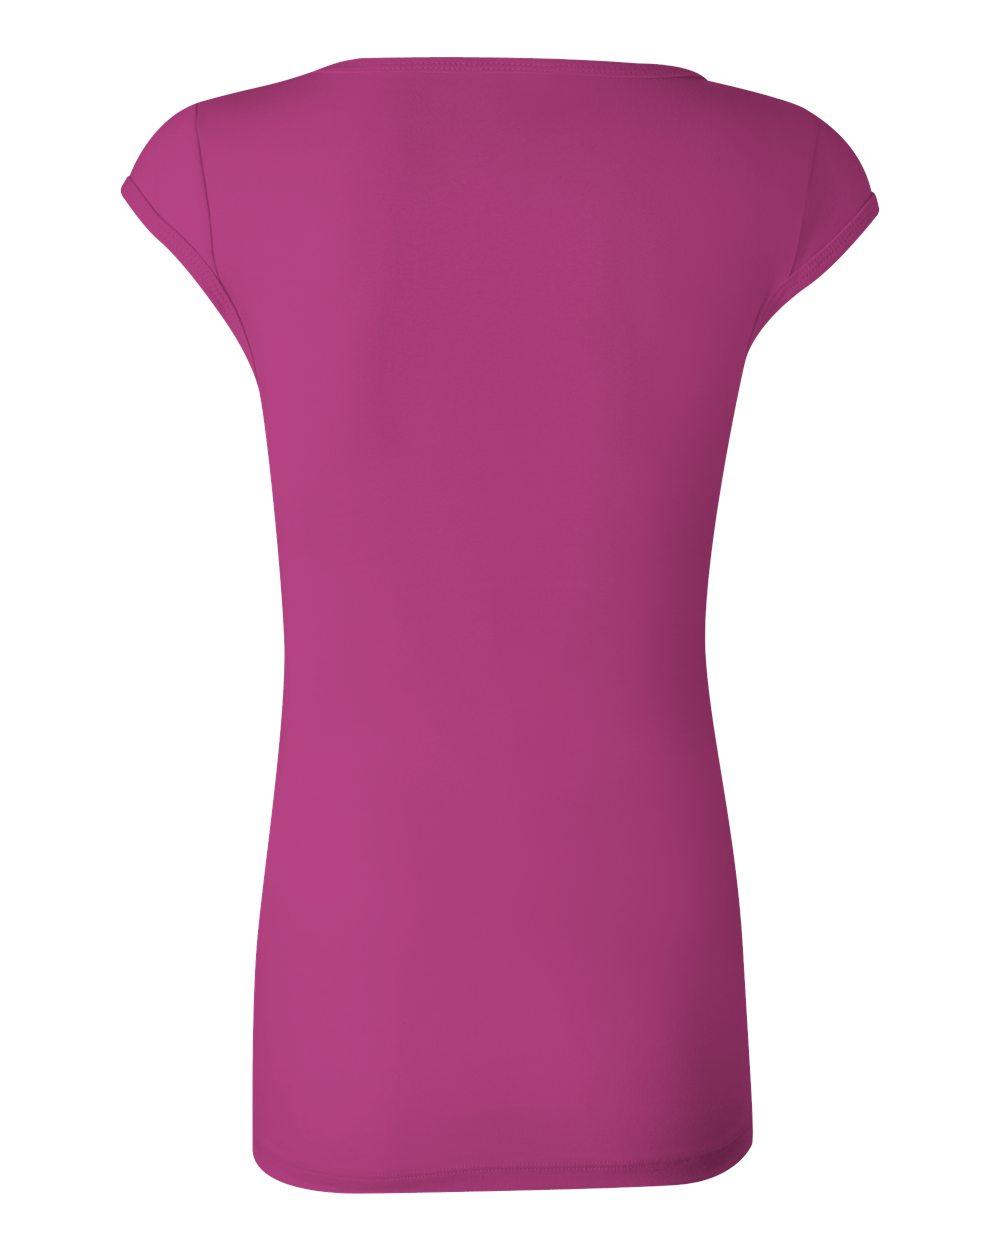 Bella-Canvas-Women-039-s-Sheer-Mini-Rib-Cap-Sleeve-Deep-V-Neck-T-Shirt-B8705-S-2XL thumbnail 7